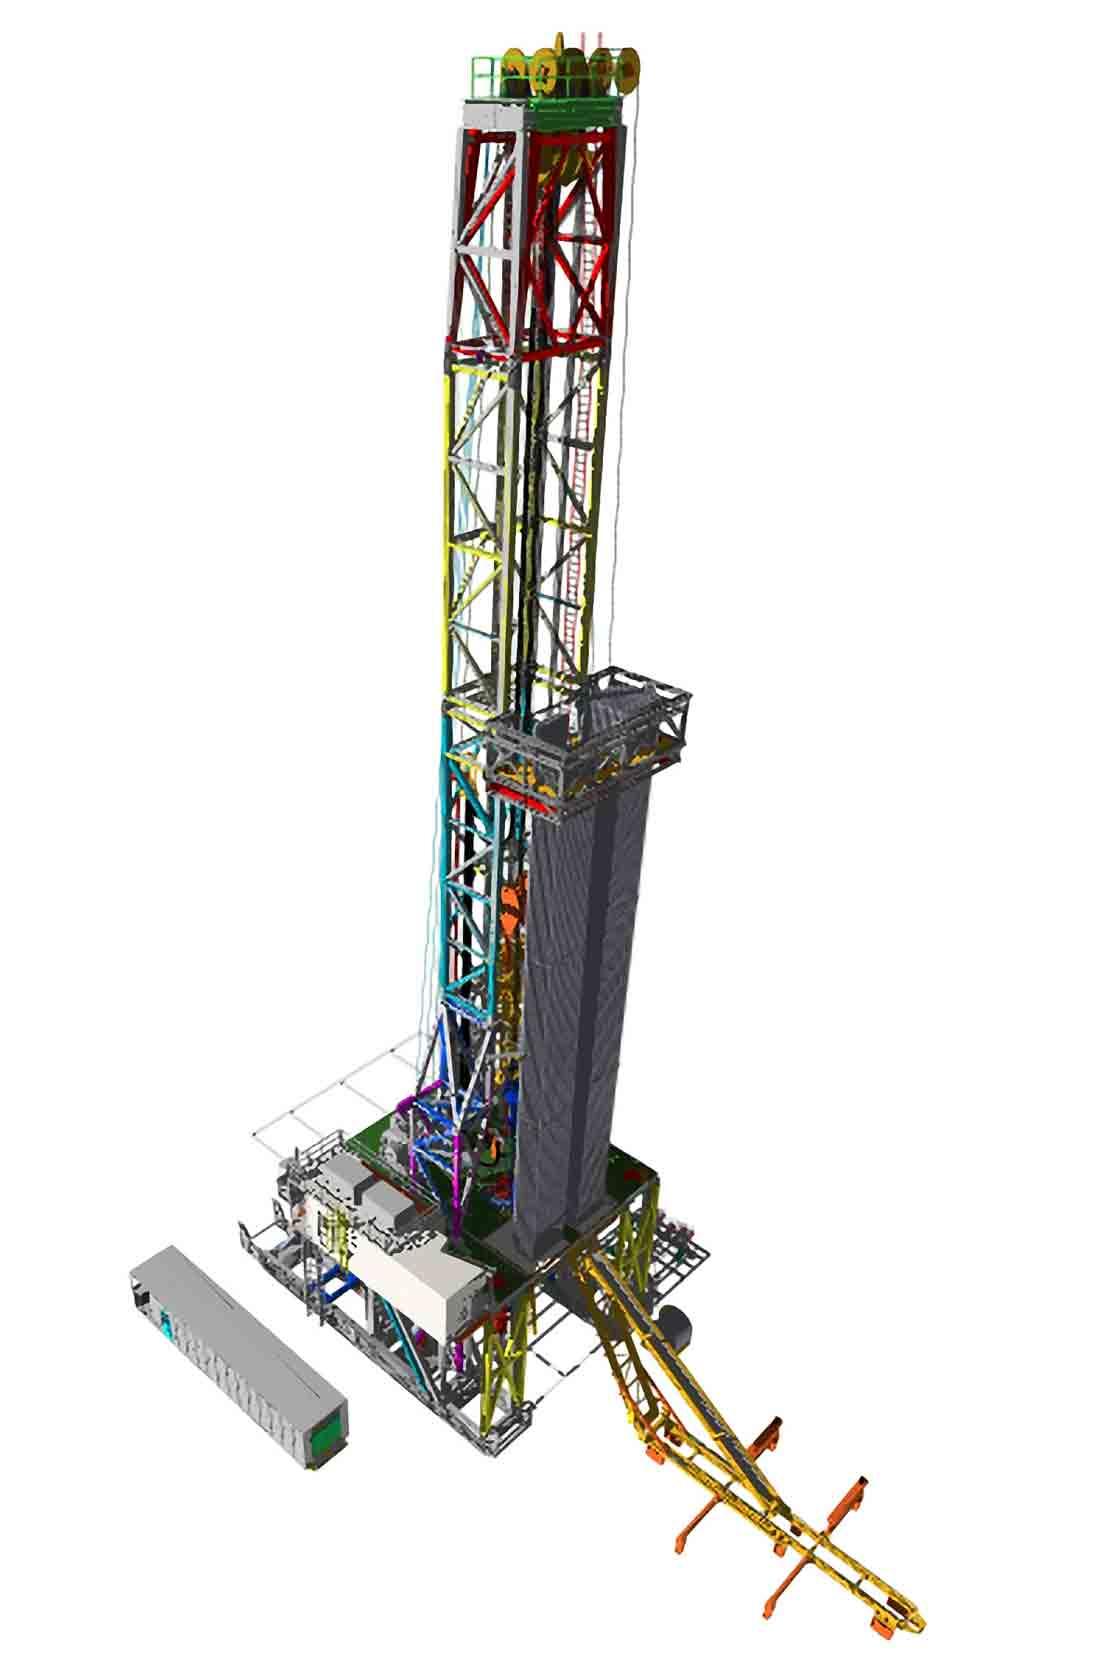 Maverick fast-moving rig isolated on white